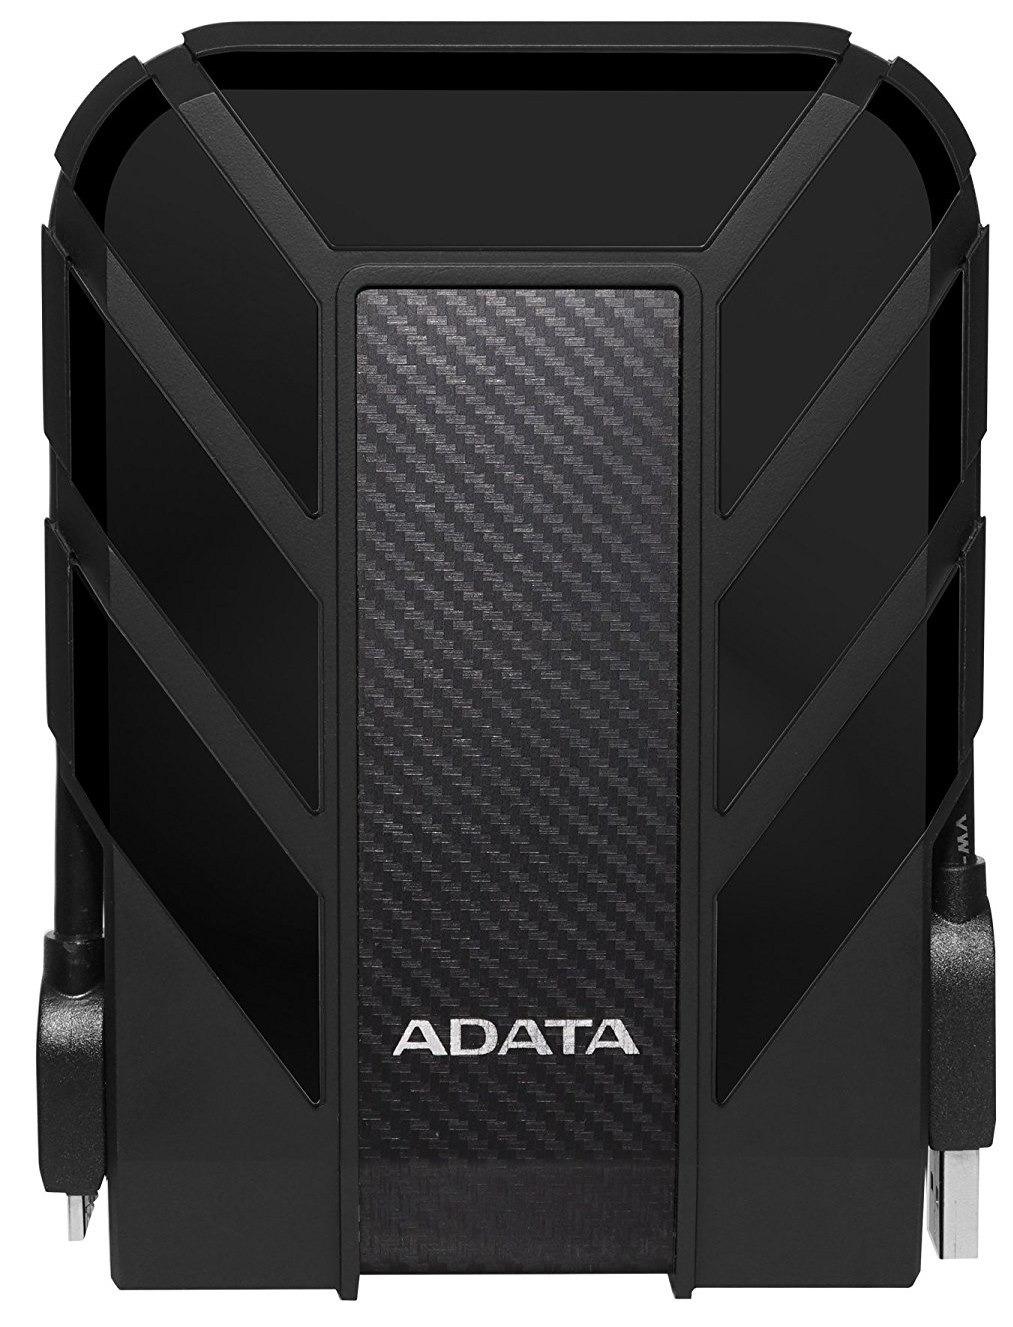 Внешний жесткий диск ADATA 5TB HD710 Pro AHD710P-5TU31-CBK, Black